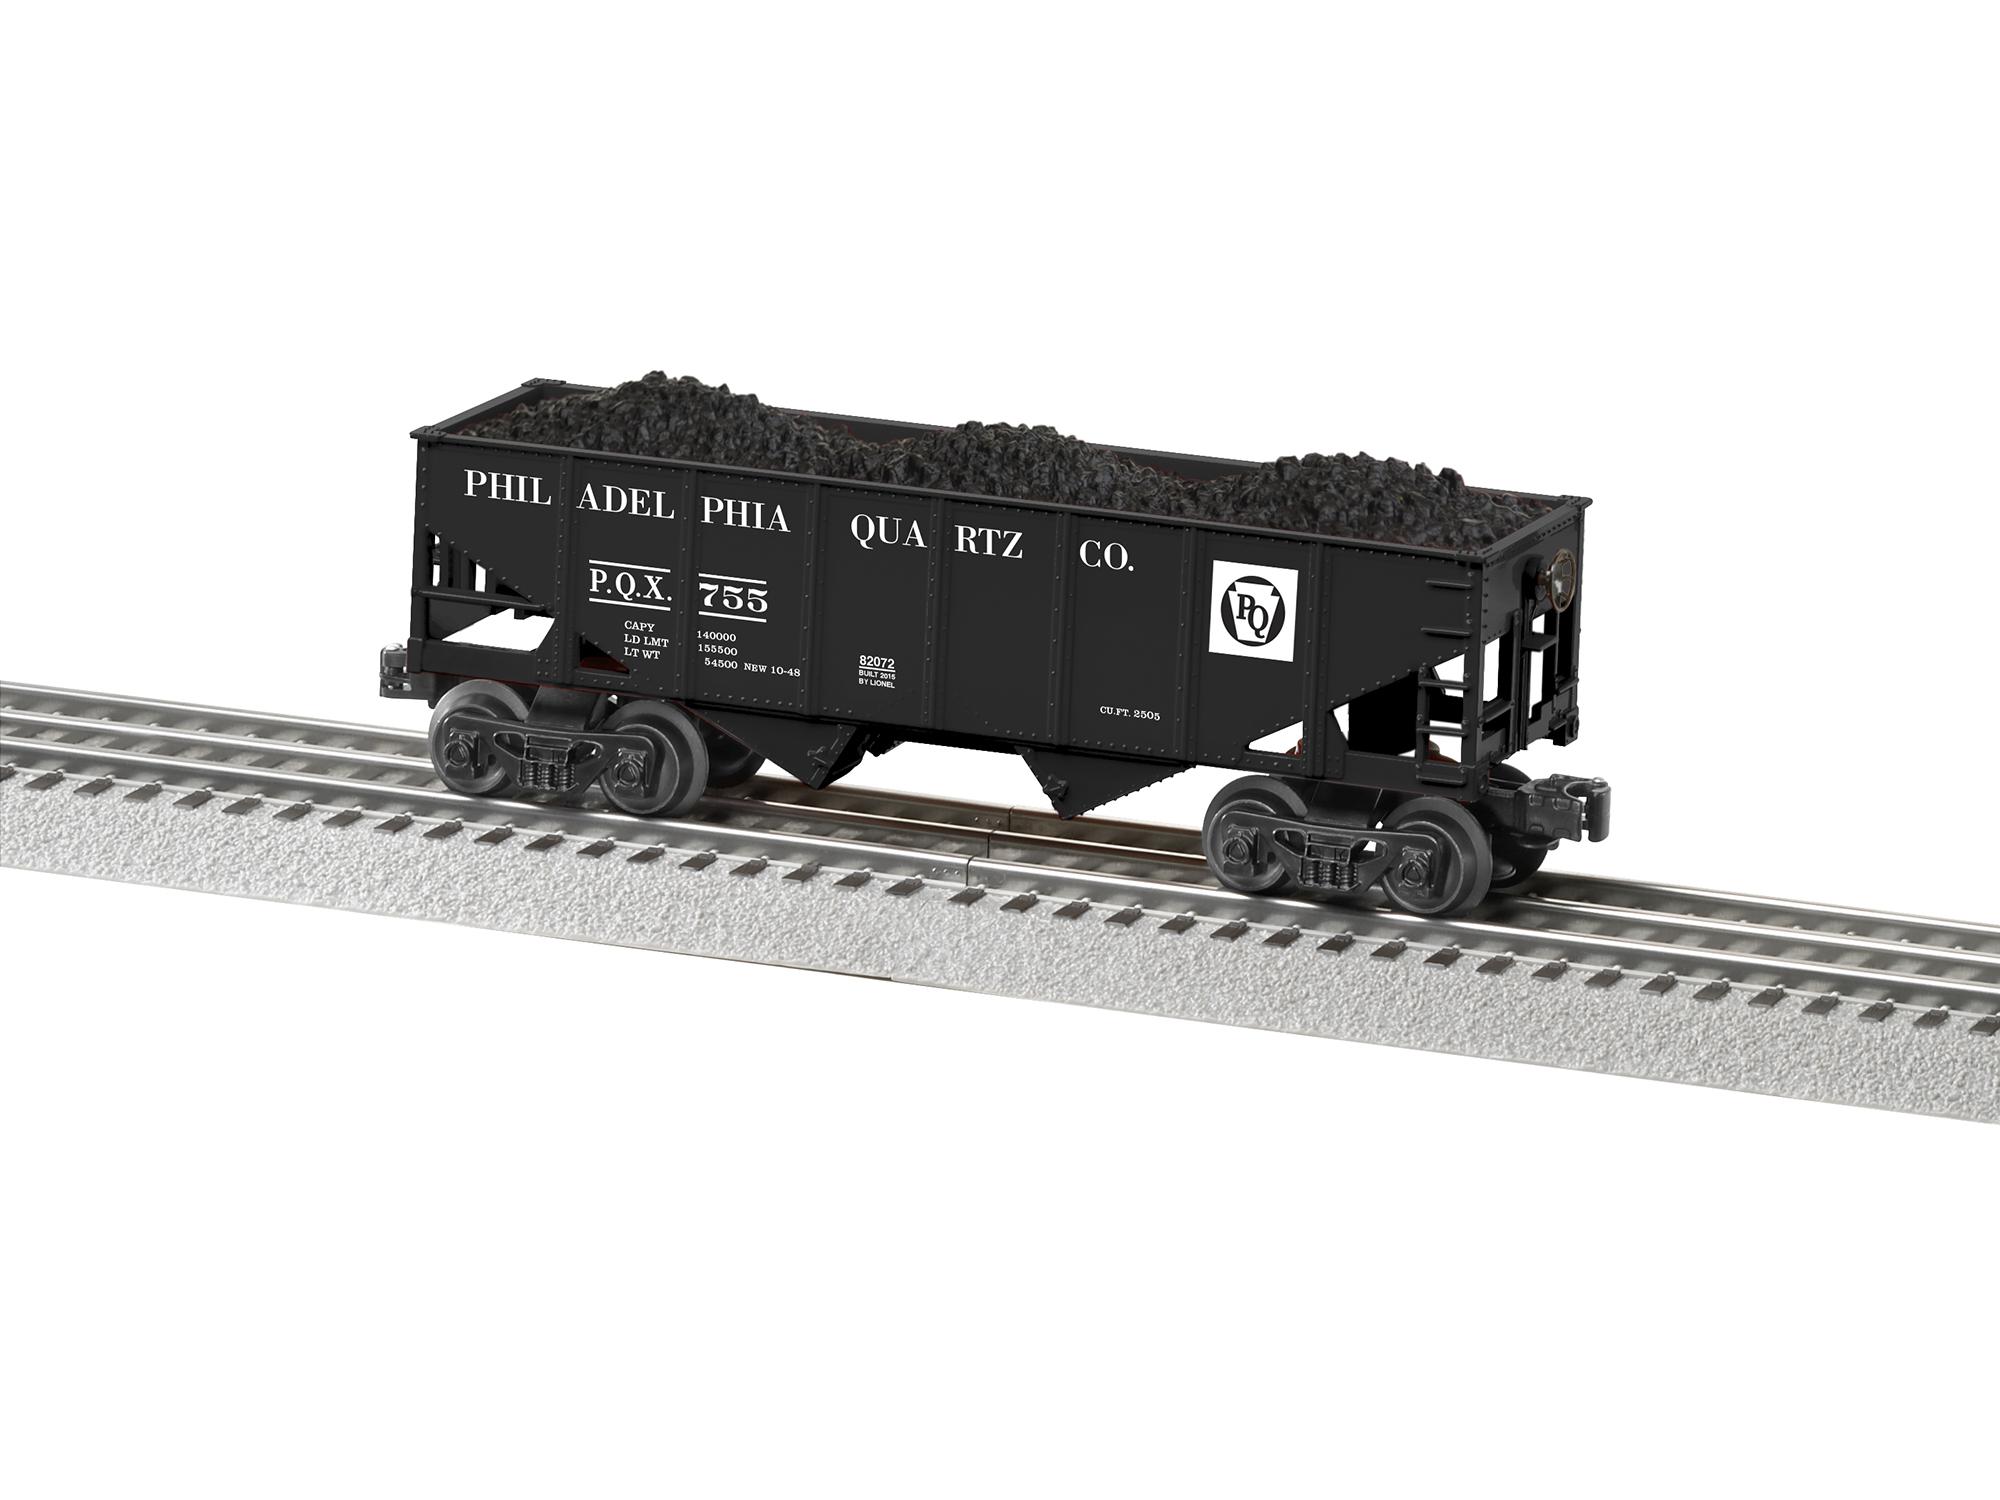 Model Train & Railroad Cars at Lionel Trains